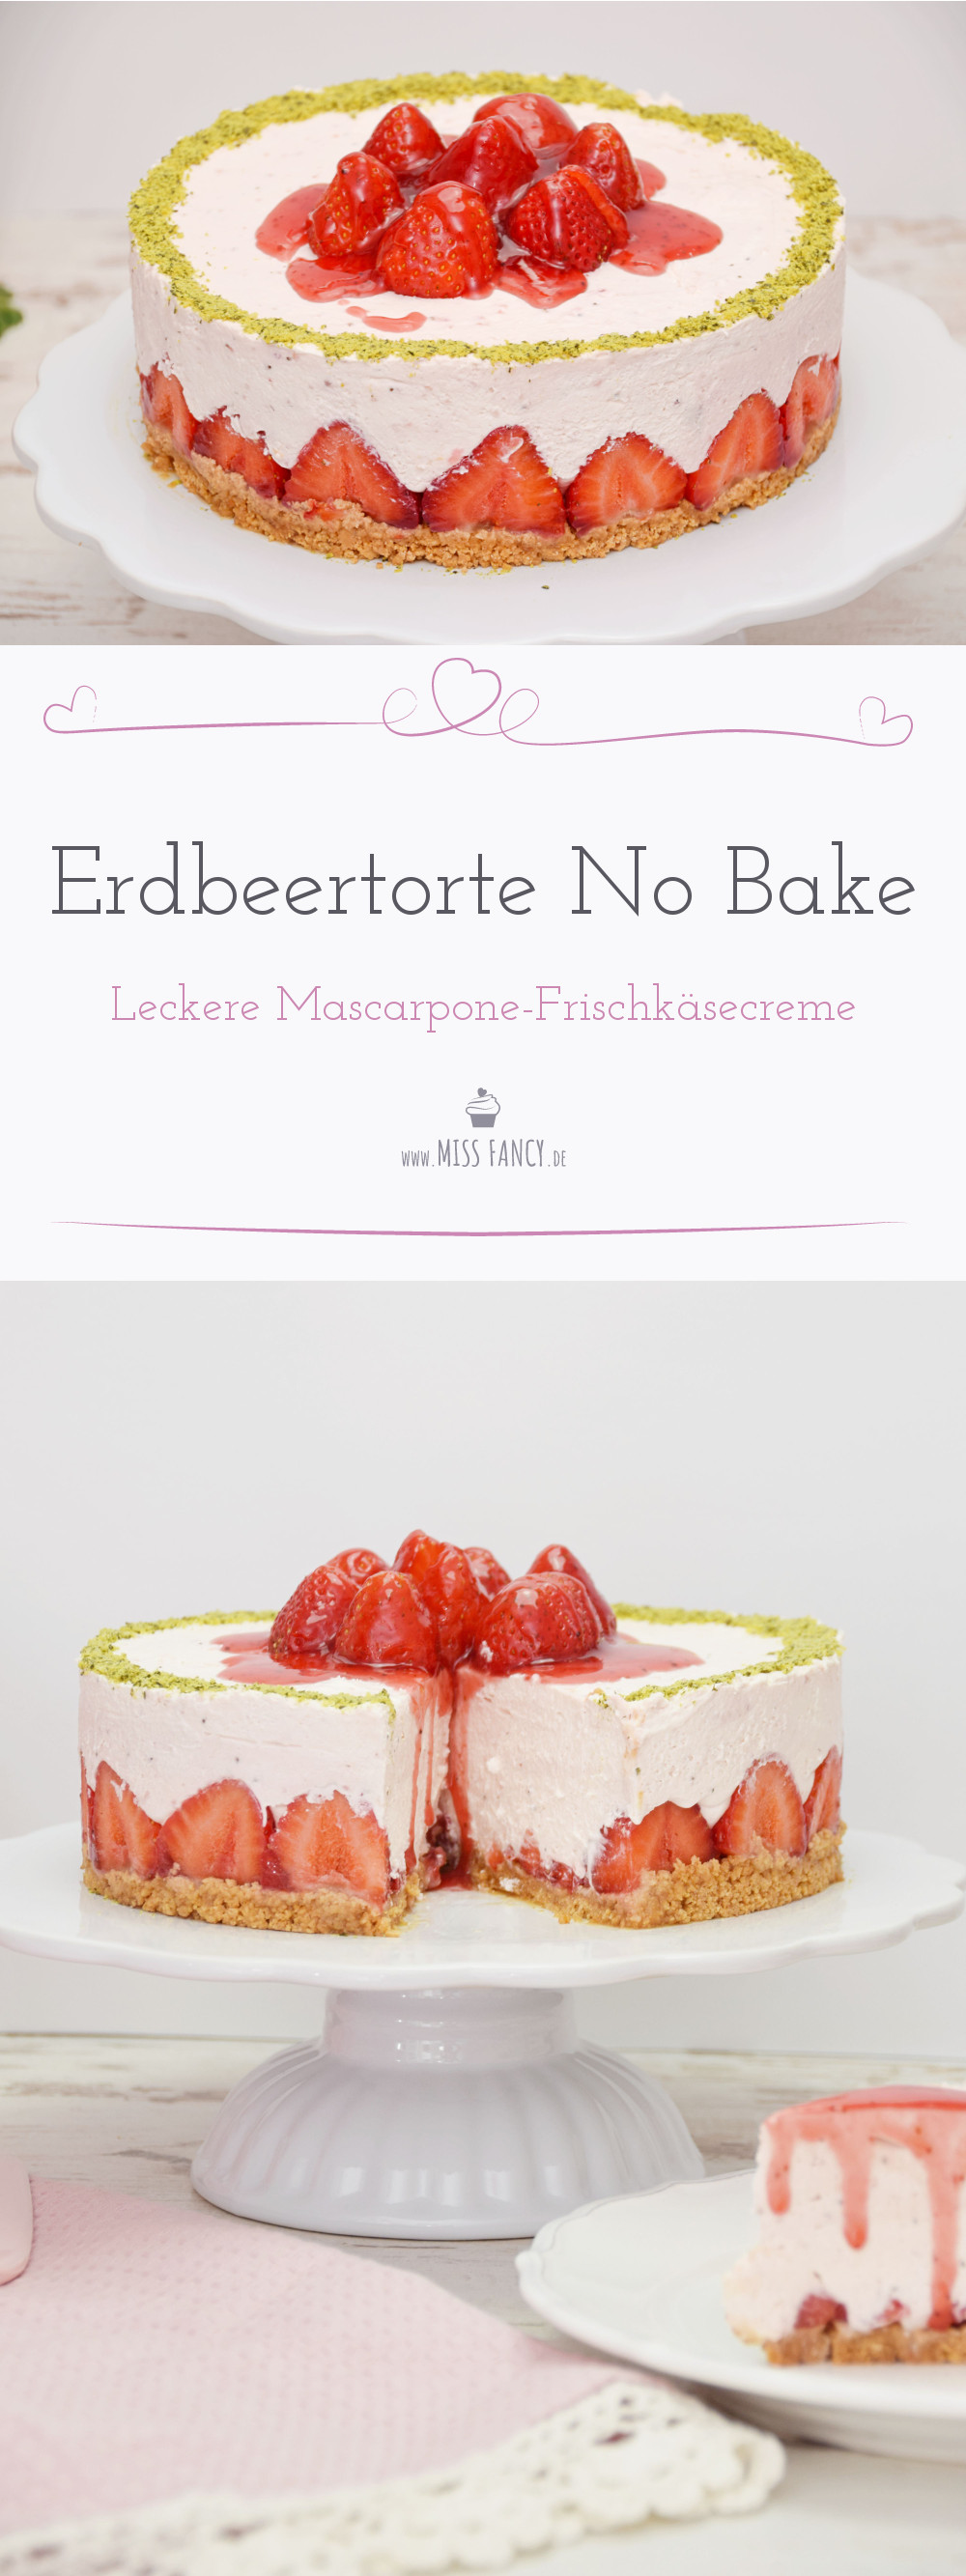 Erdbeertorte-leckere-Mascarpone-Frischkäsecreme-Rezept